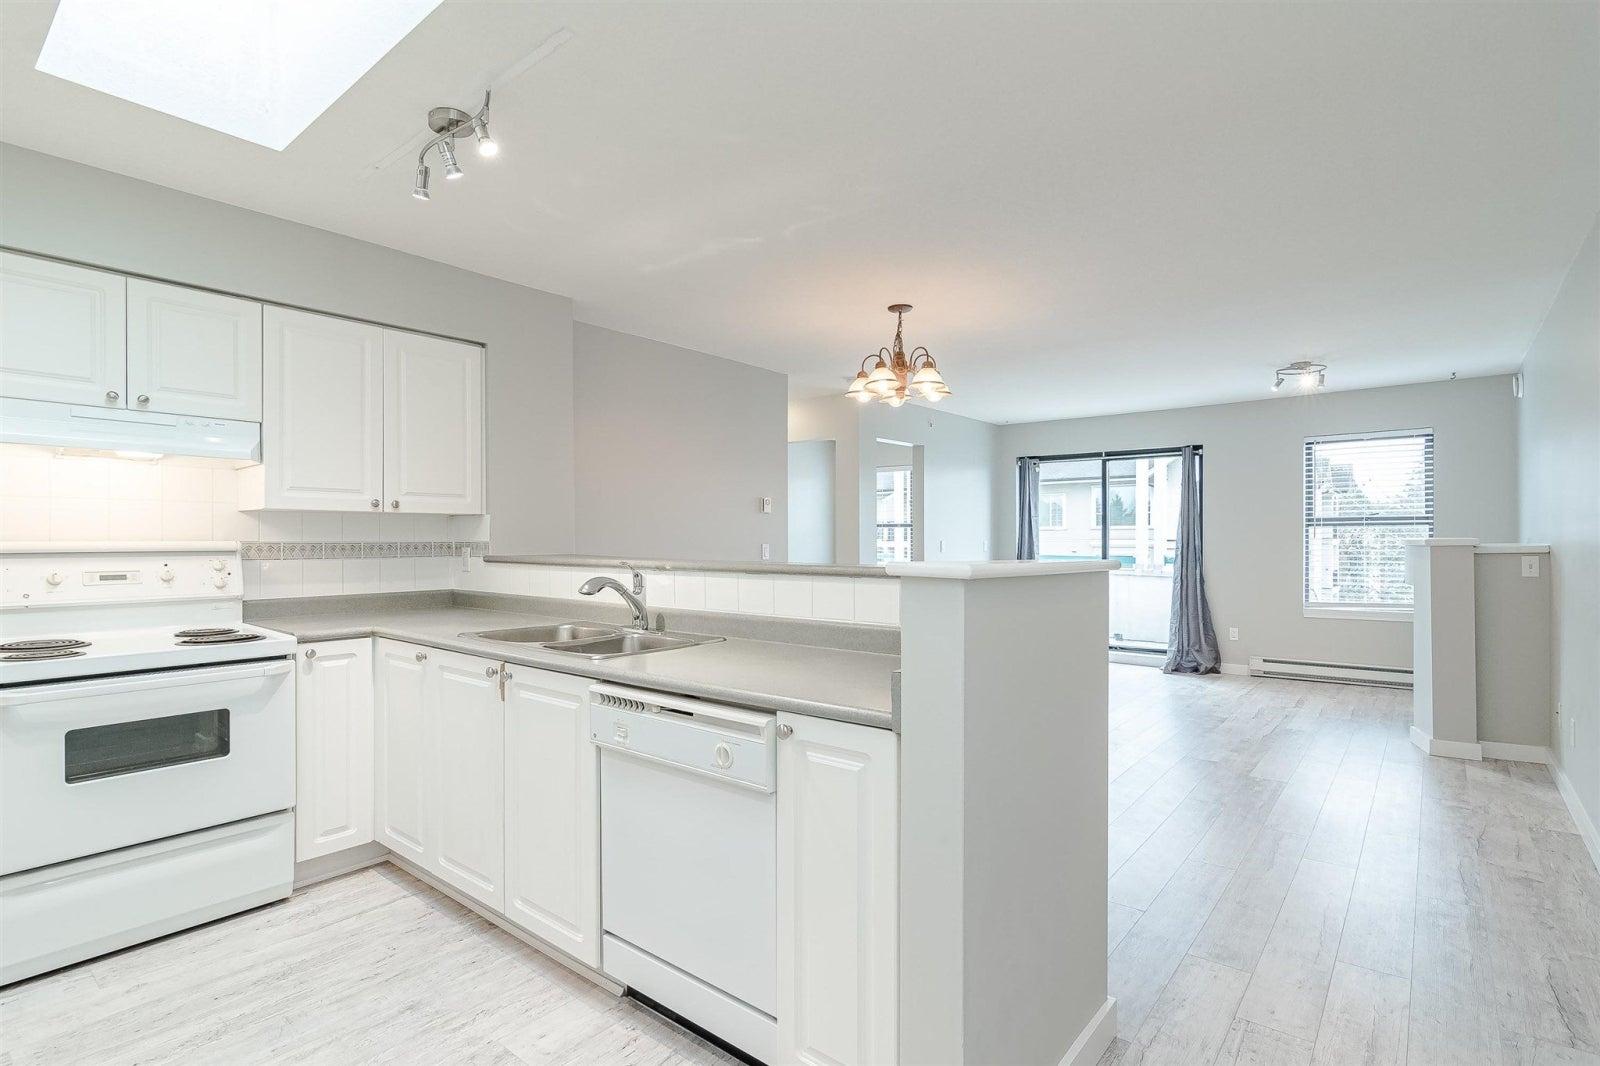 405 20268 54 AVENUE - Langley City Apartment/Condo for sale, 2 Bedrooms (R2604183) #7